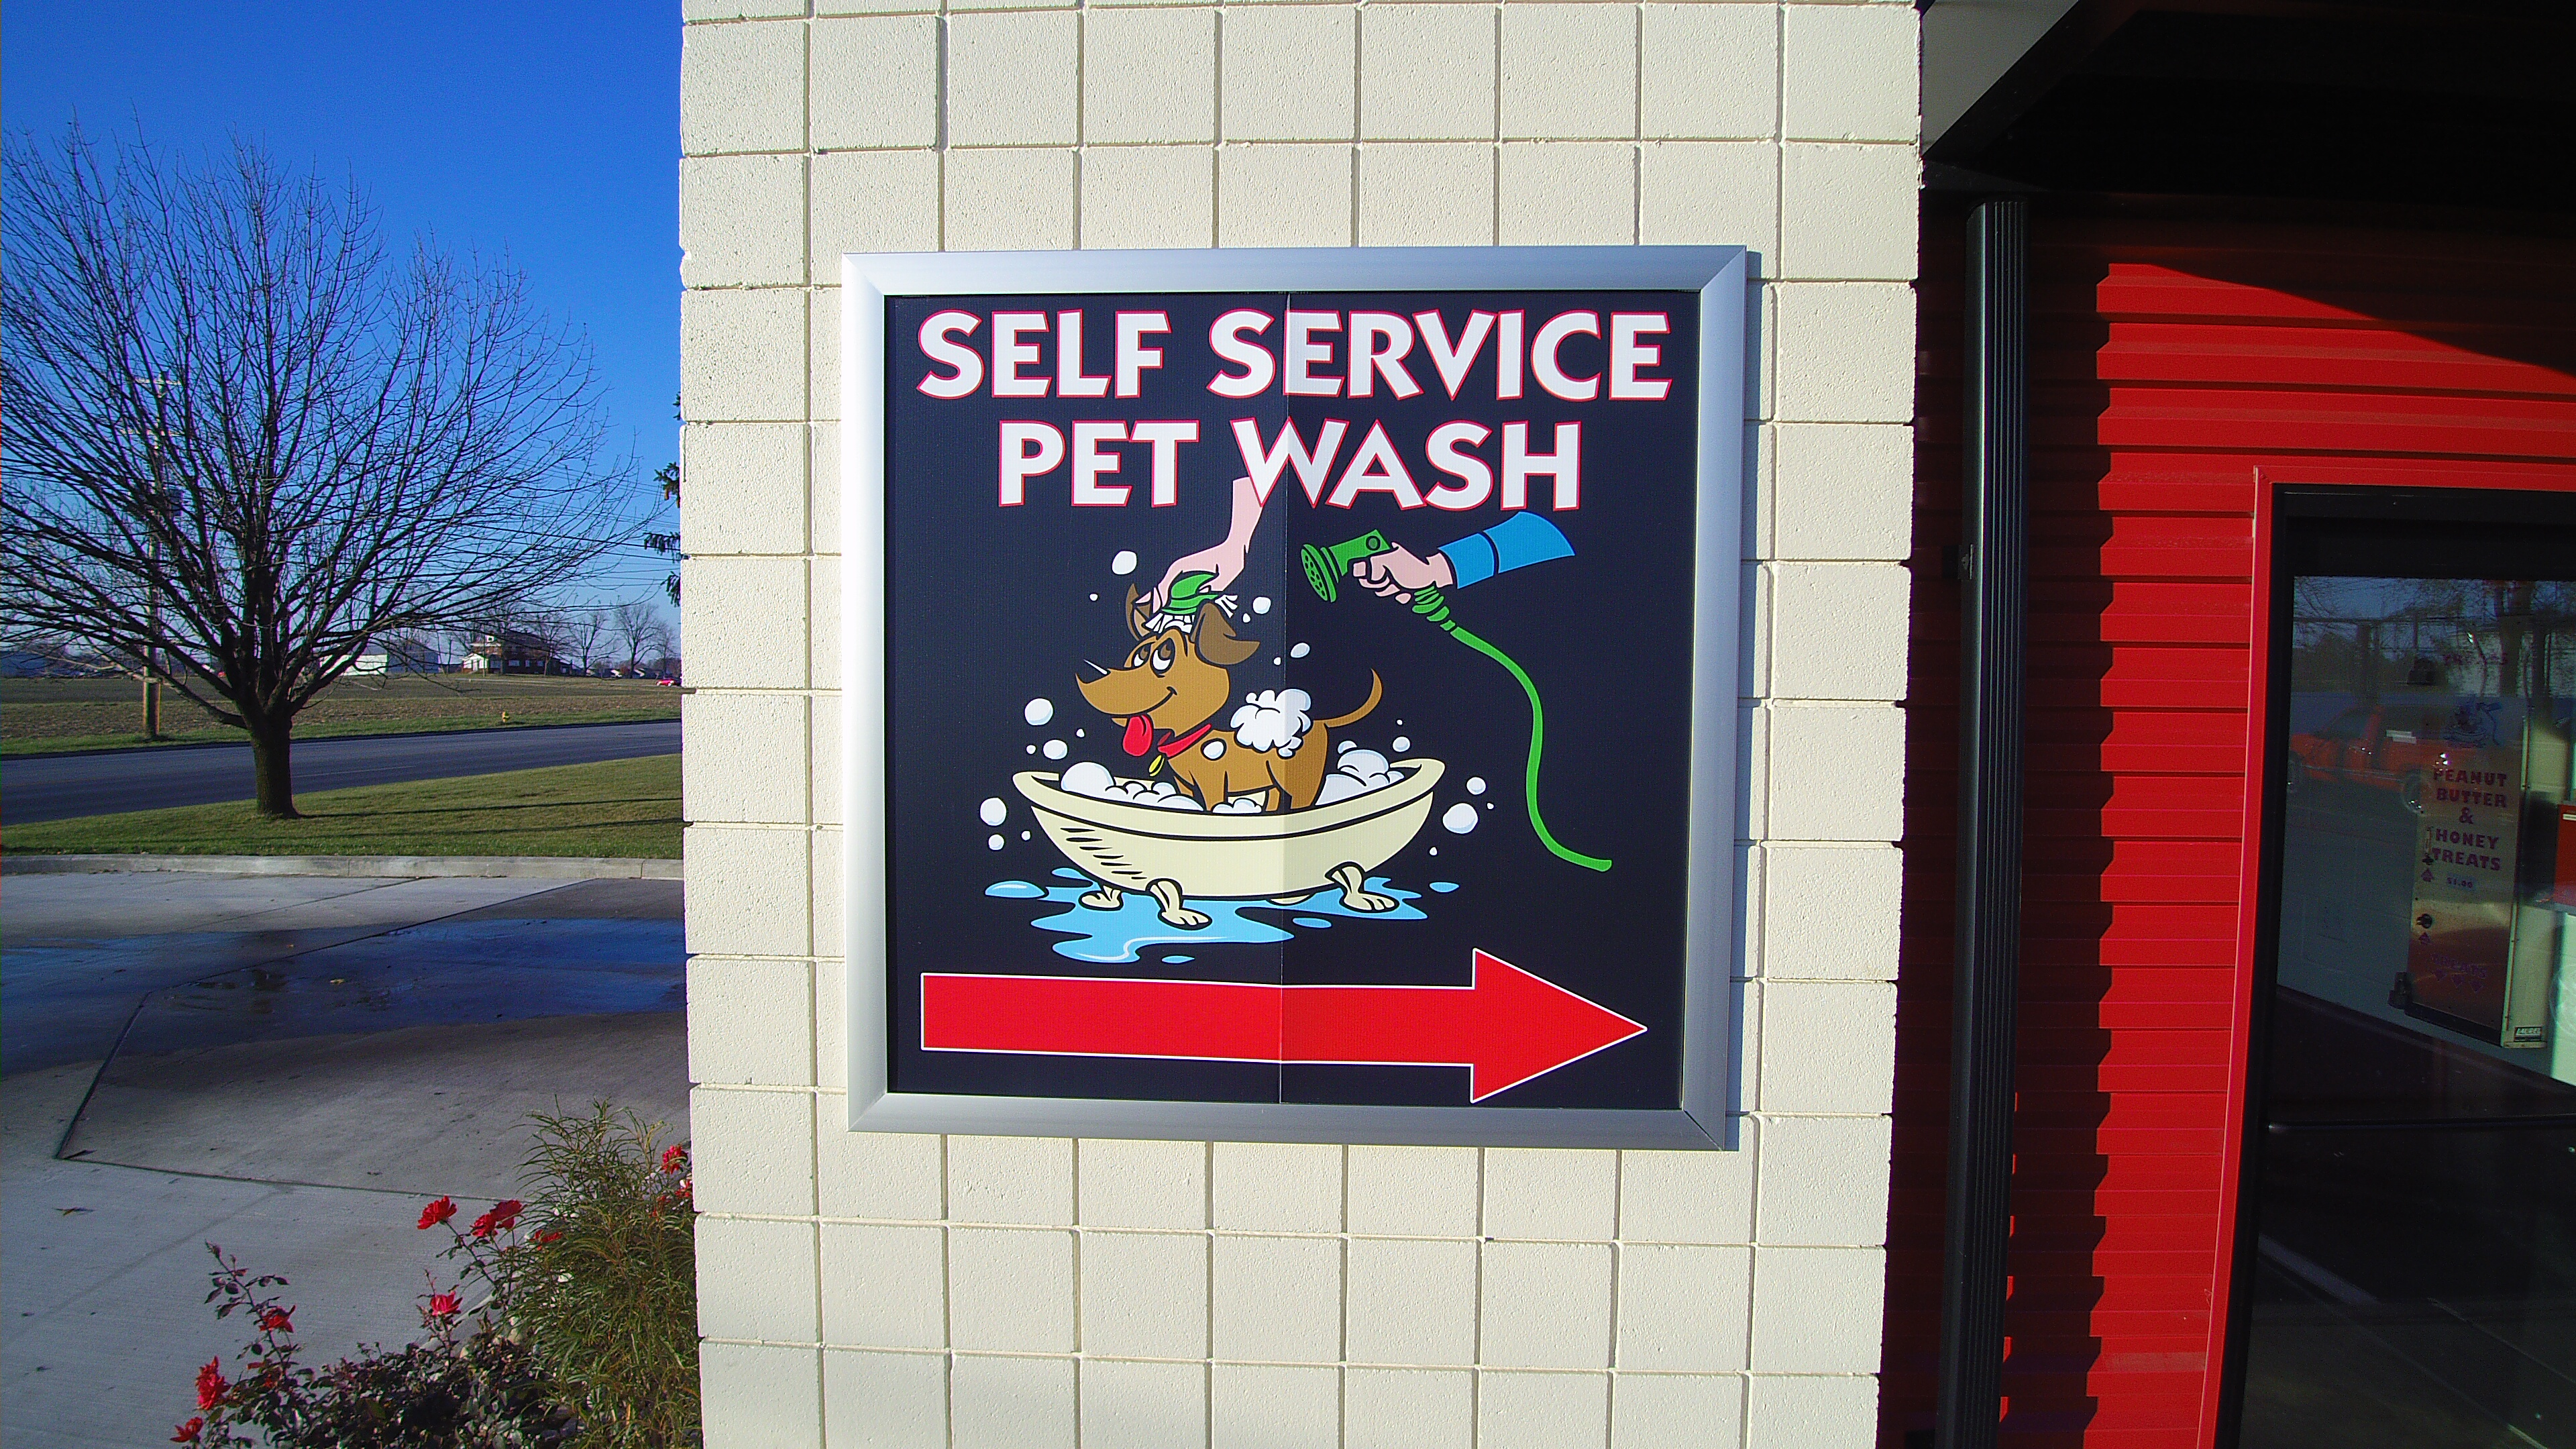 4 Seasons Car Wash image 1